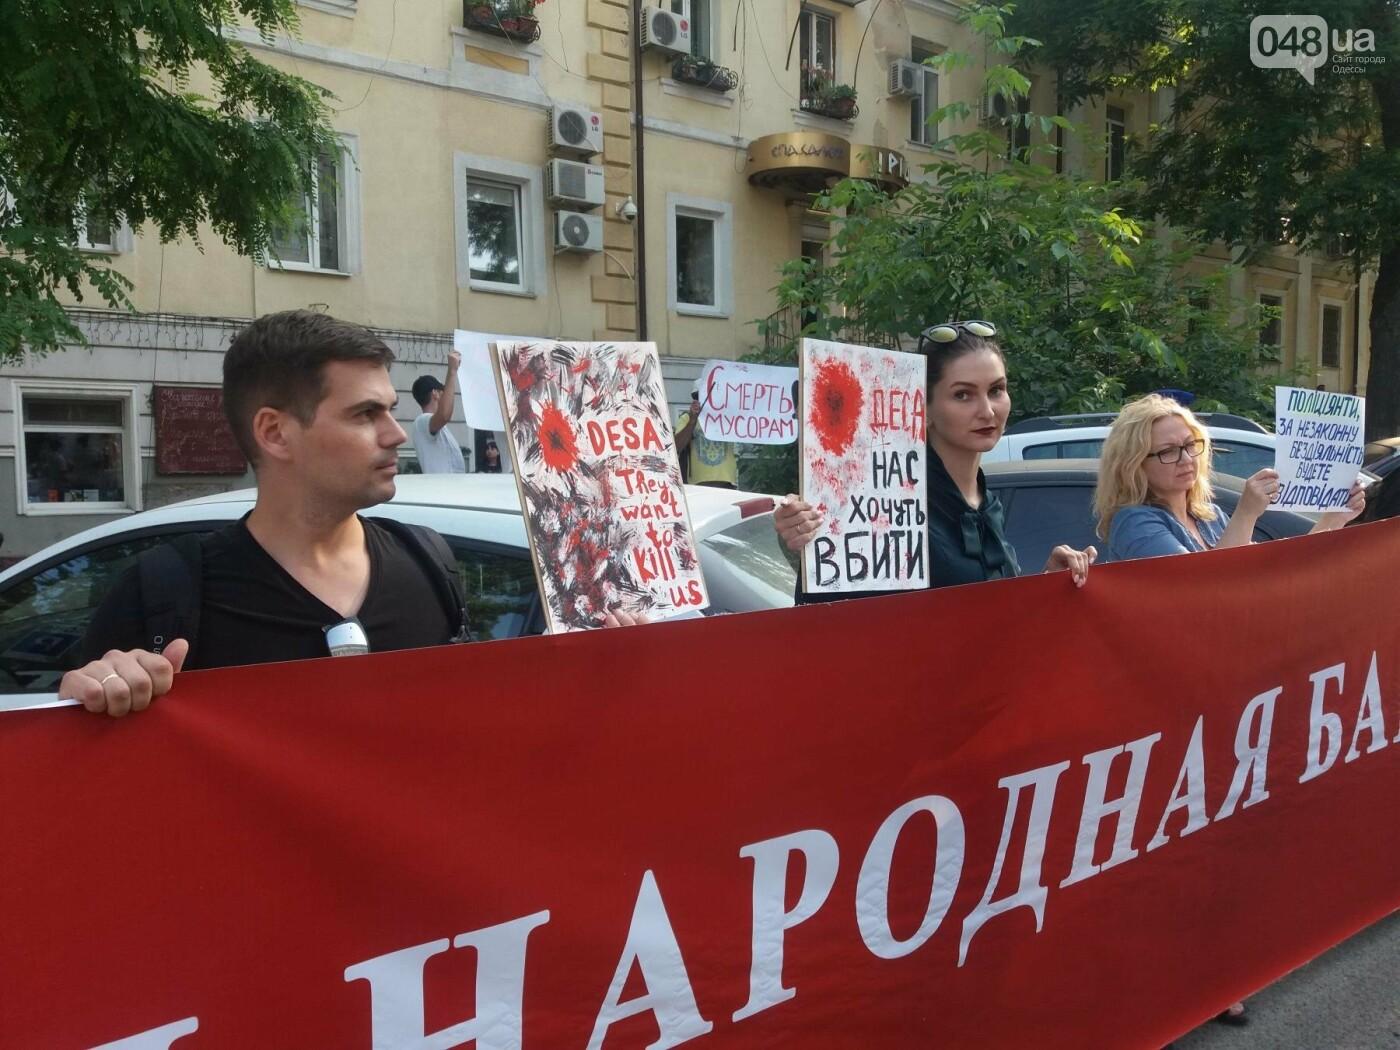 В Одессе протестовали против нападений на активистов и журналистов, - ФОТО, ВИДЕО, фото-2